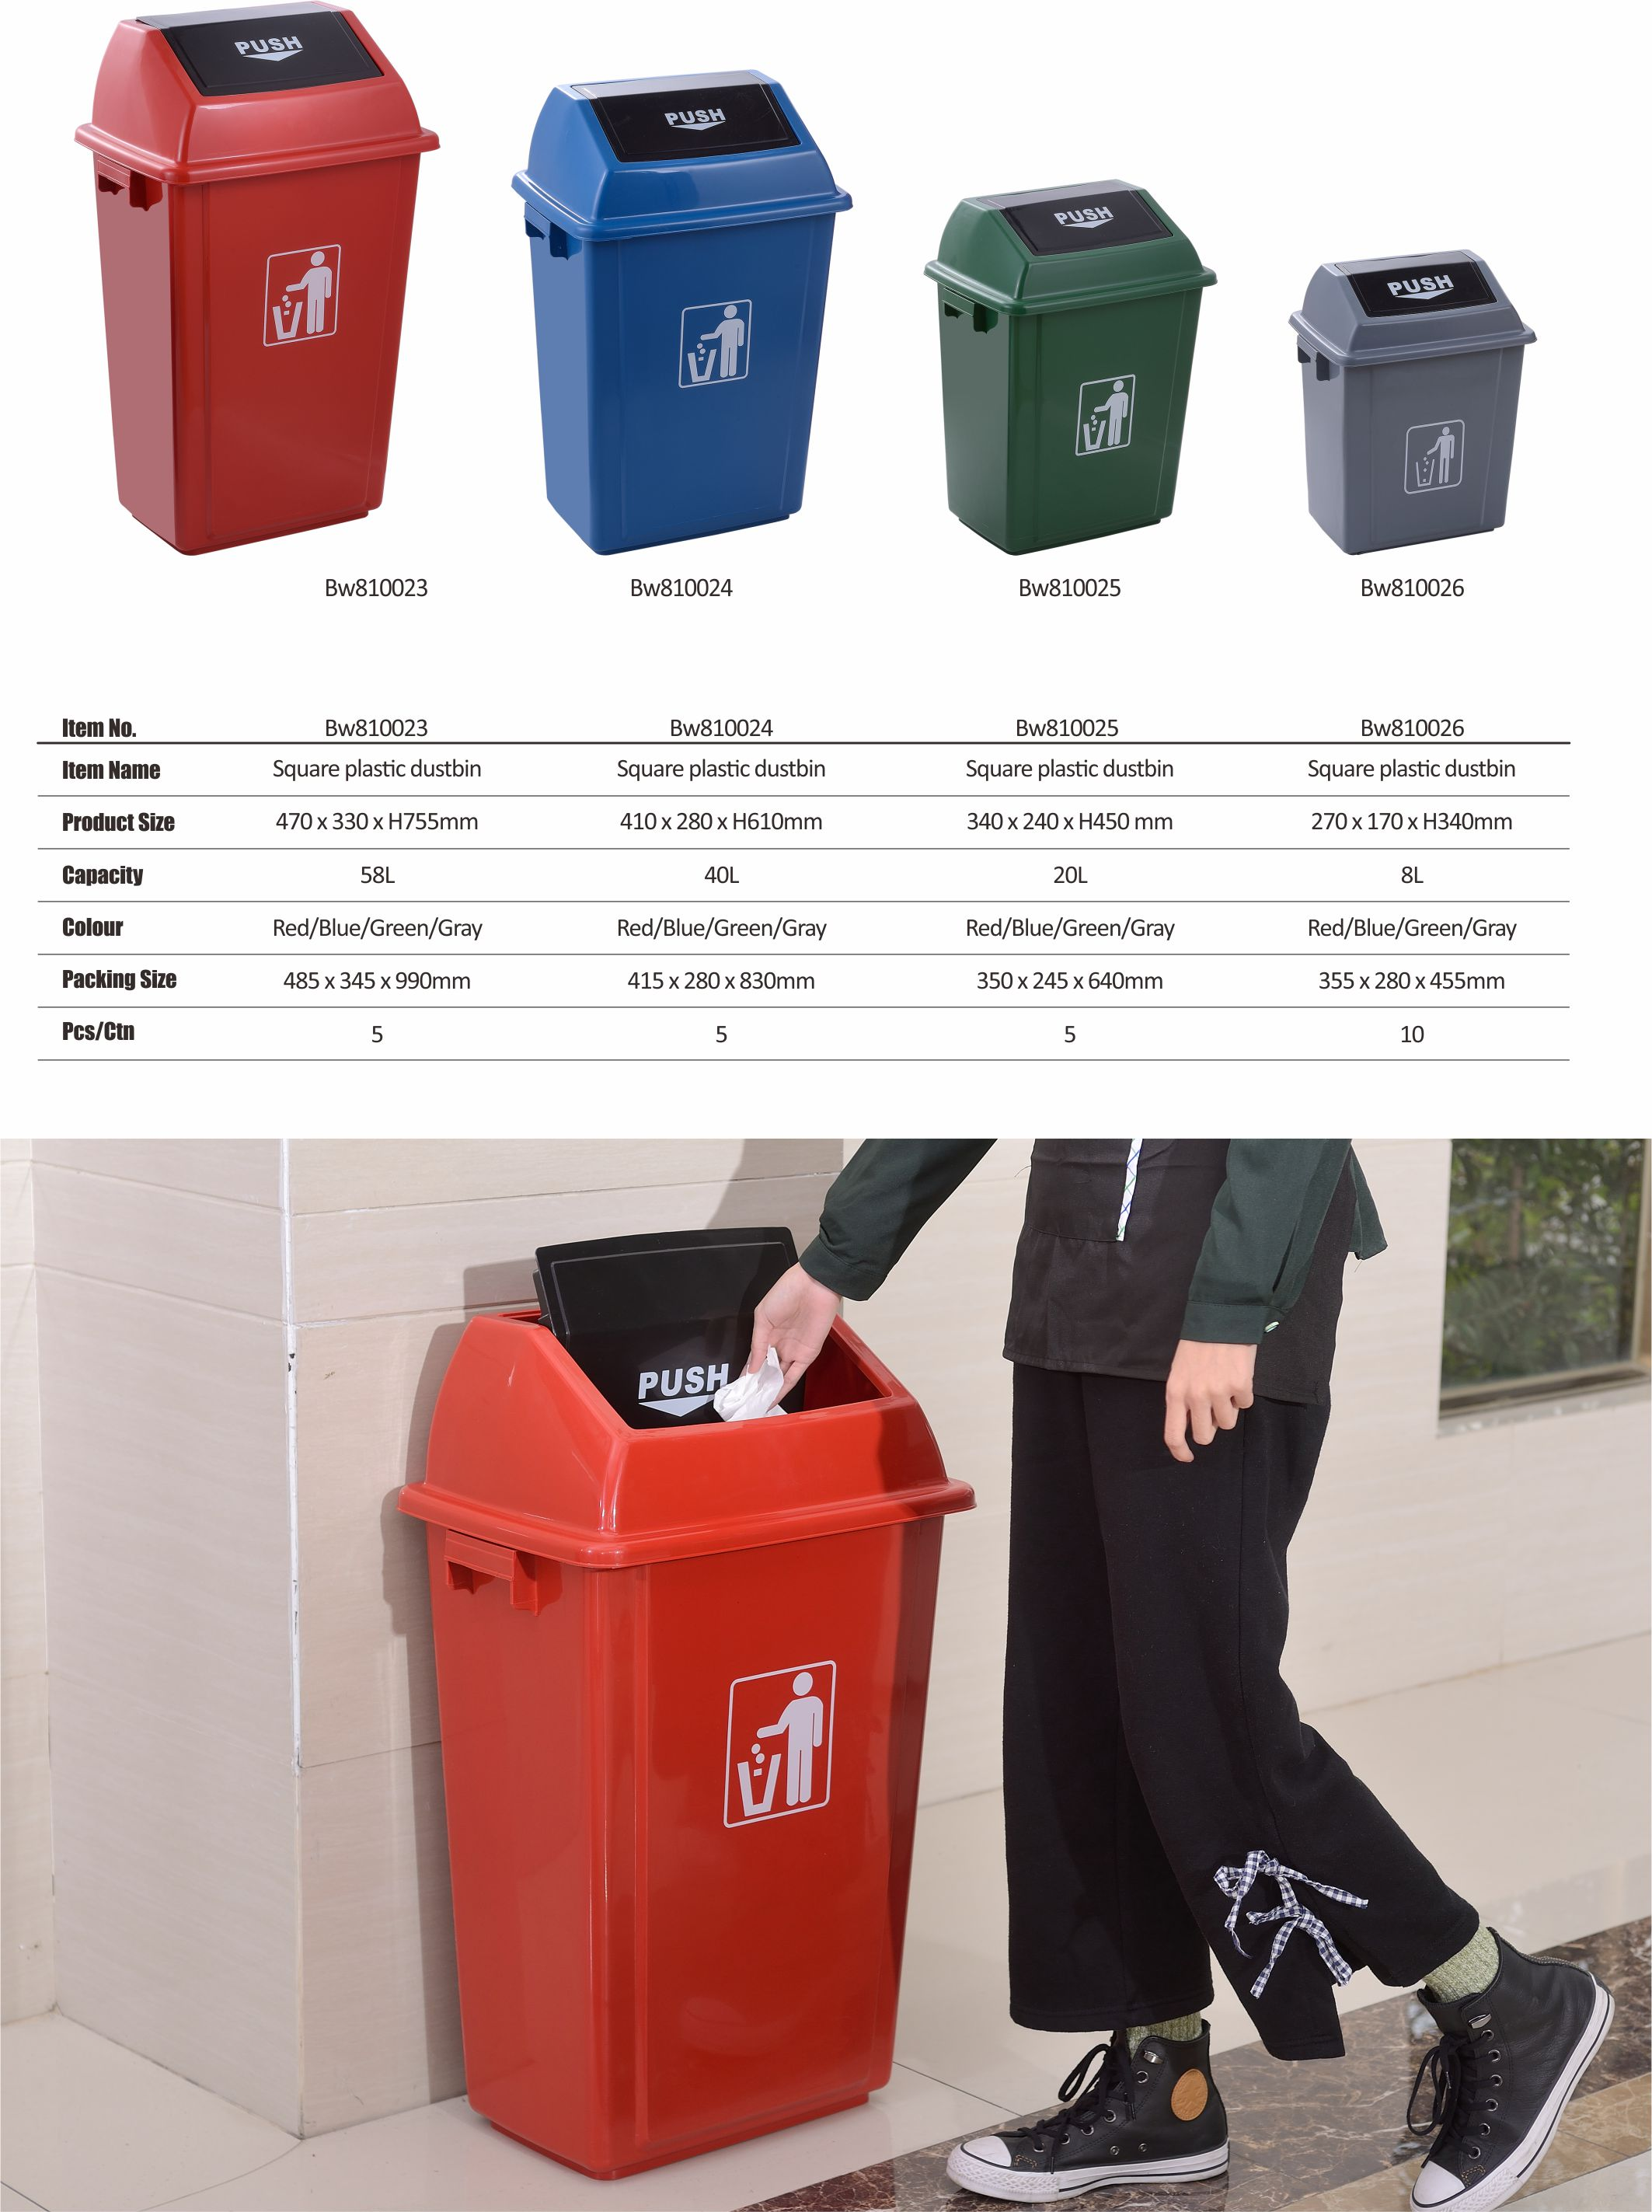 Wheelie Bin Cleaning >> Red 40L 58L Square plastic dustbin sanitary 8L 20L garbage ...